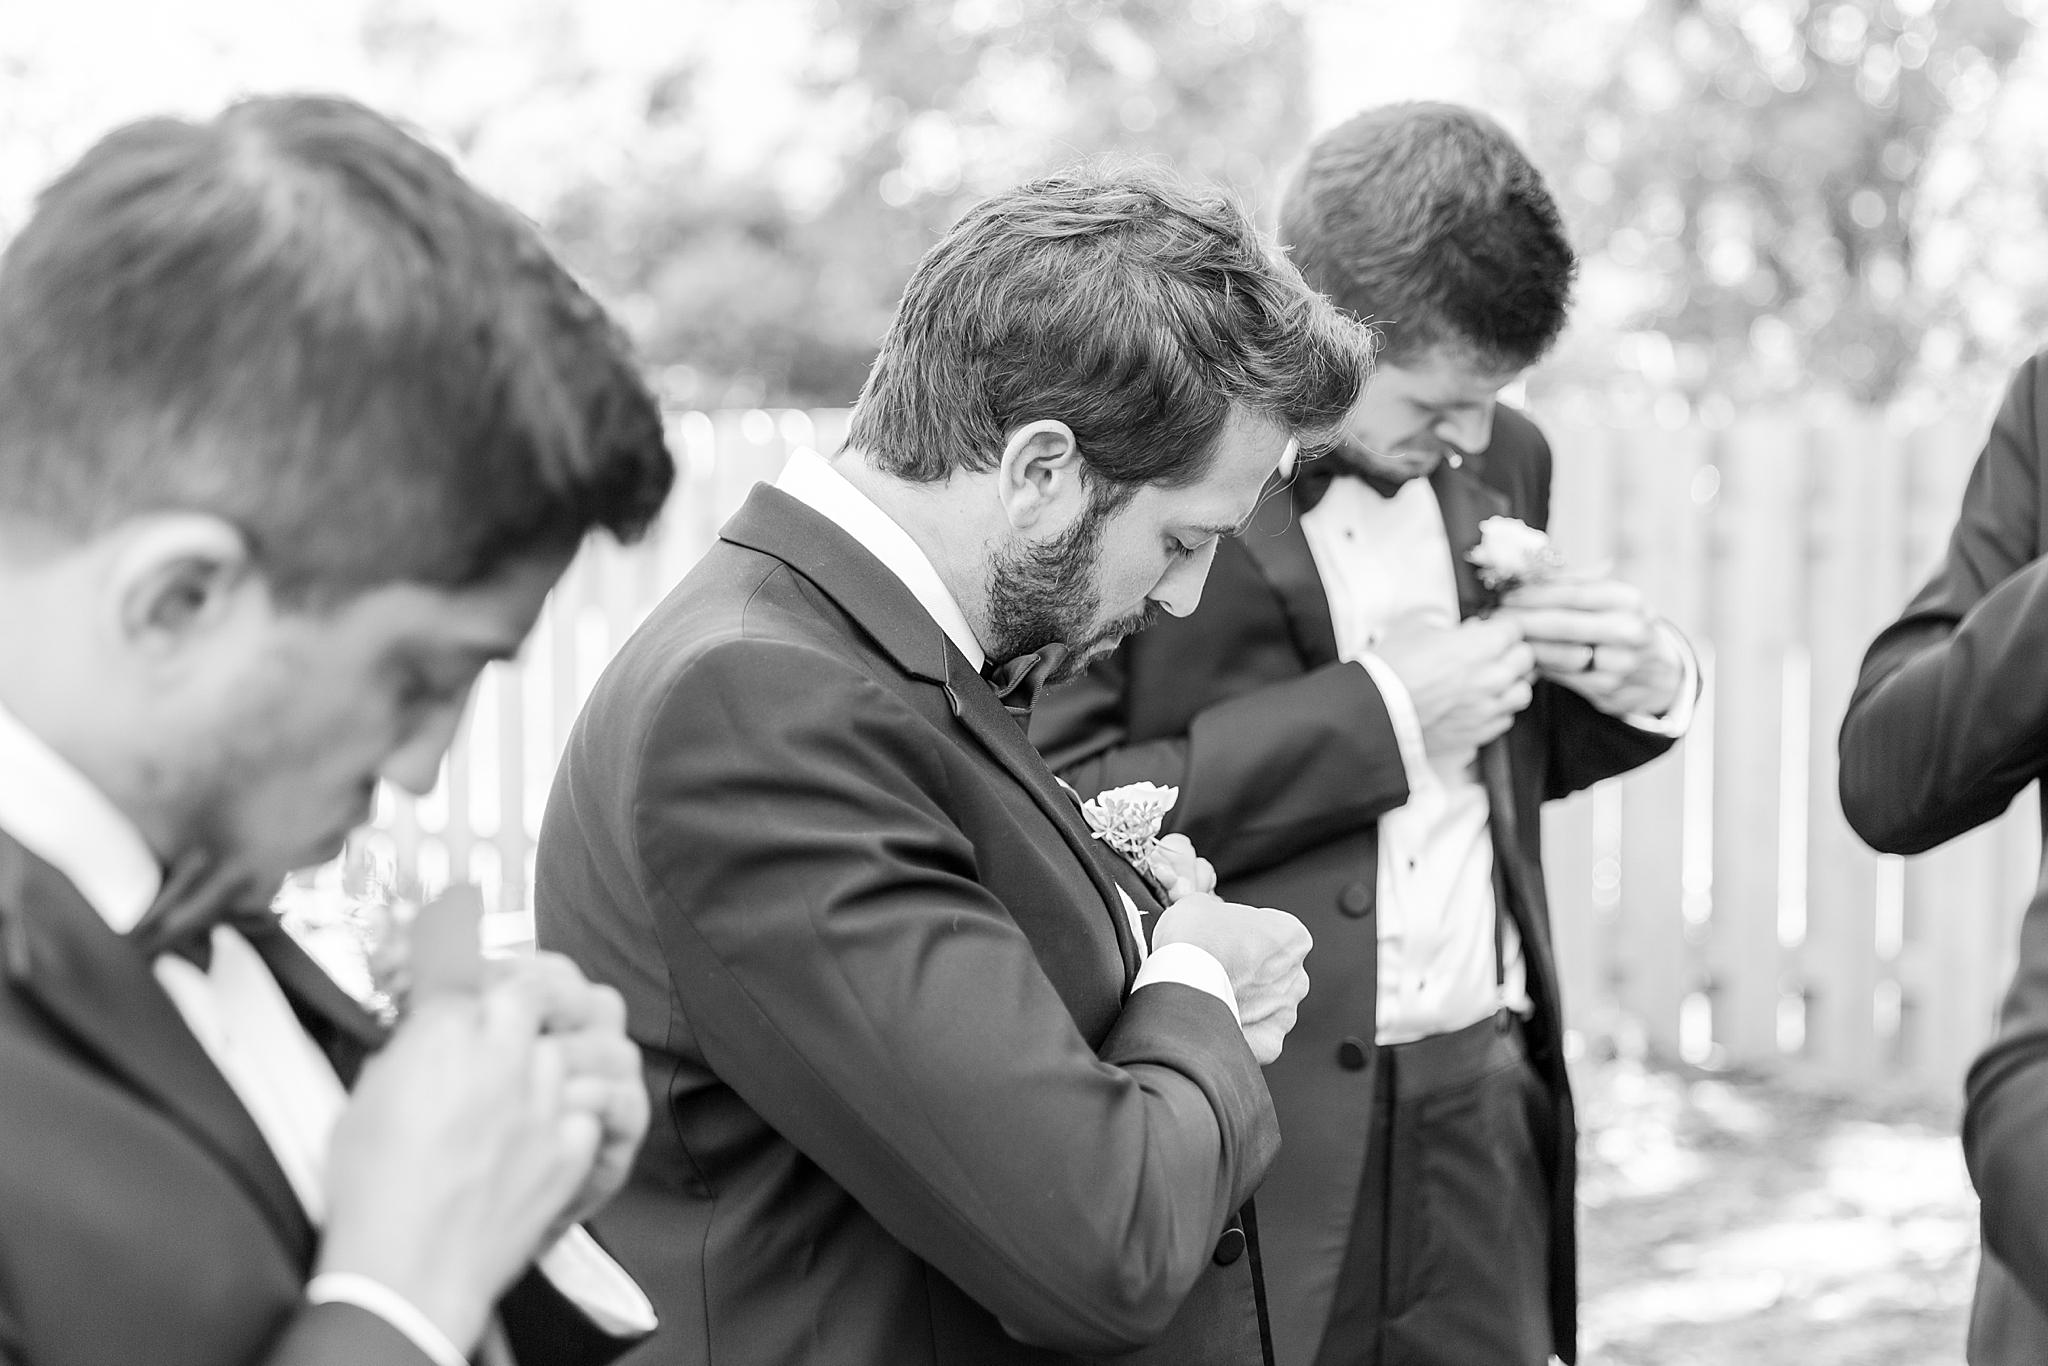 detroit-wedding-photographer-grosse-pointe-academy-chapel-detroit-golf-club-wedding-carly-matt-by-courtney-carolyn-photography_0008.jpg